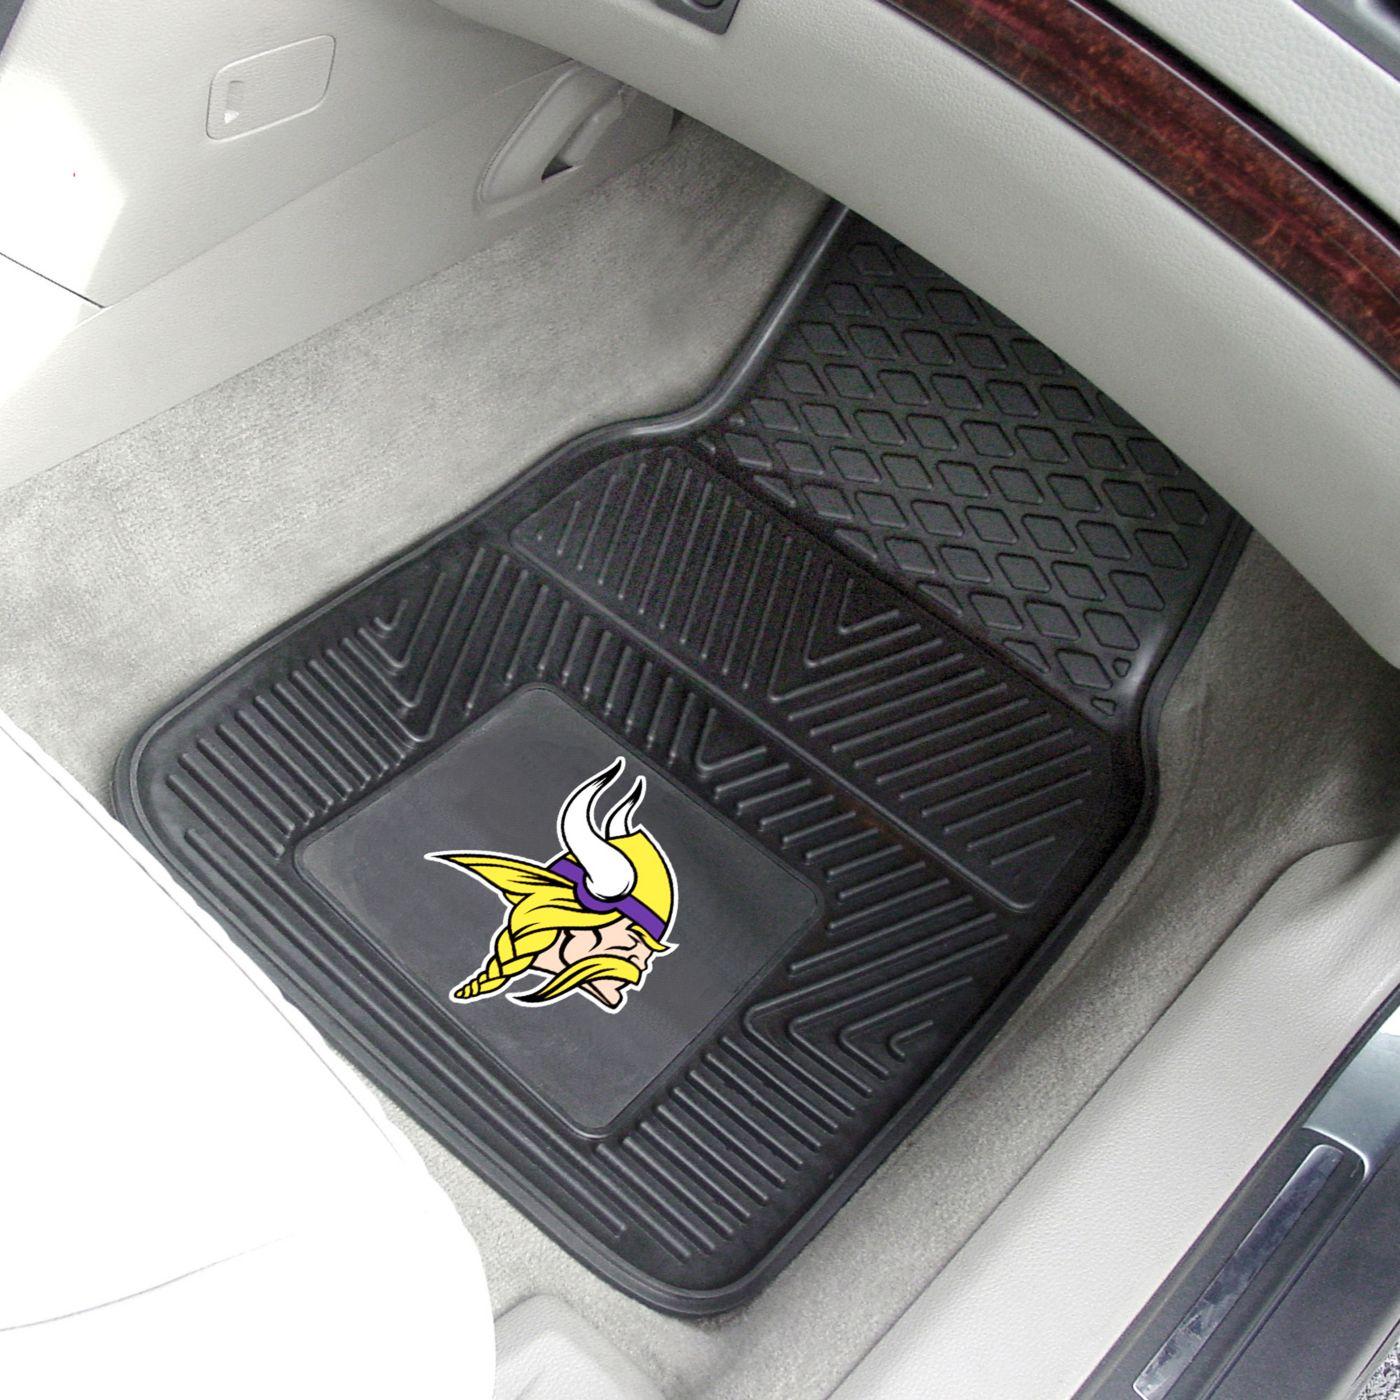 FANMATS Minnesota Vikings 2-Piece Heavy Duty Vinyl Car Mat Set